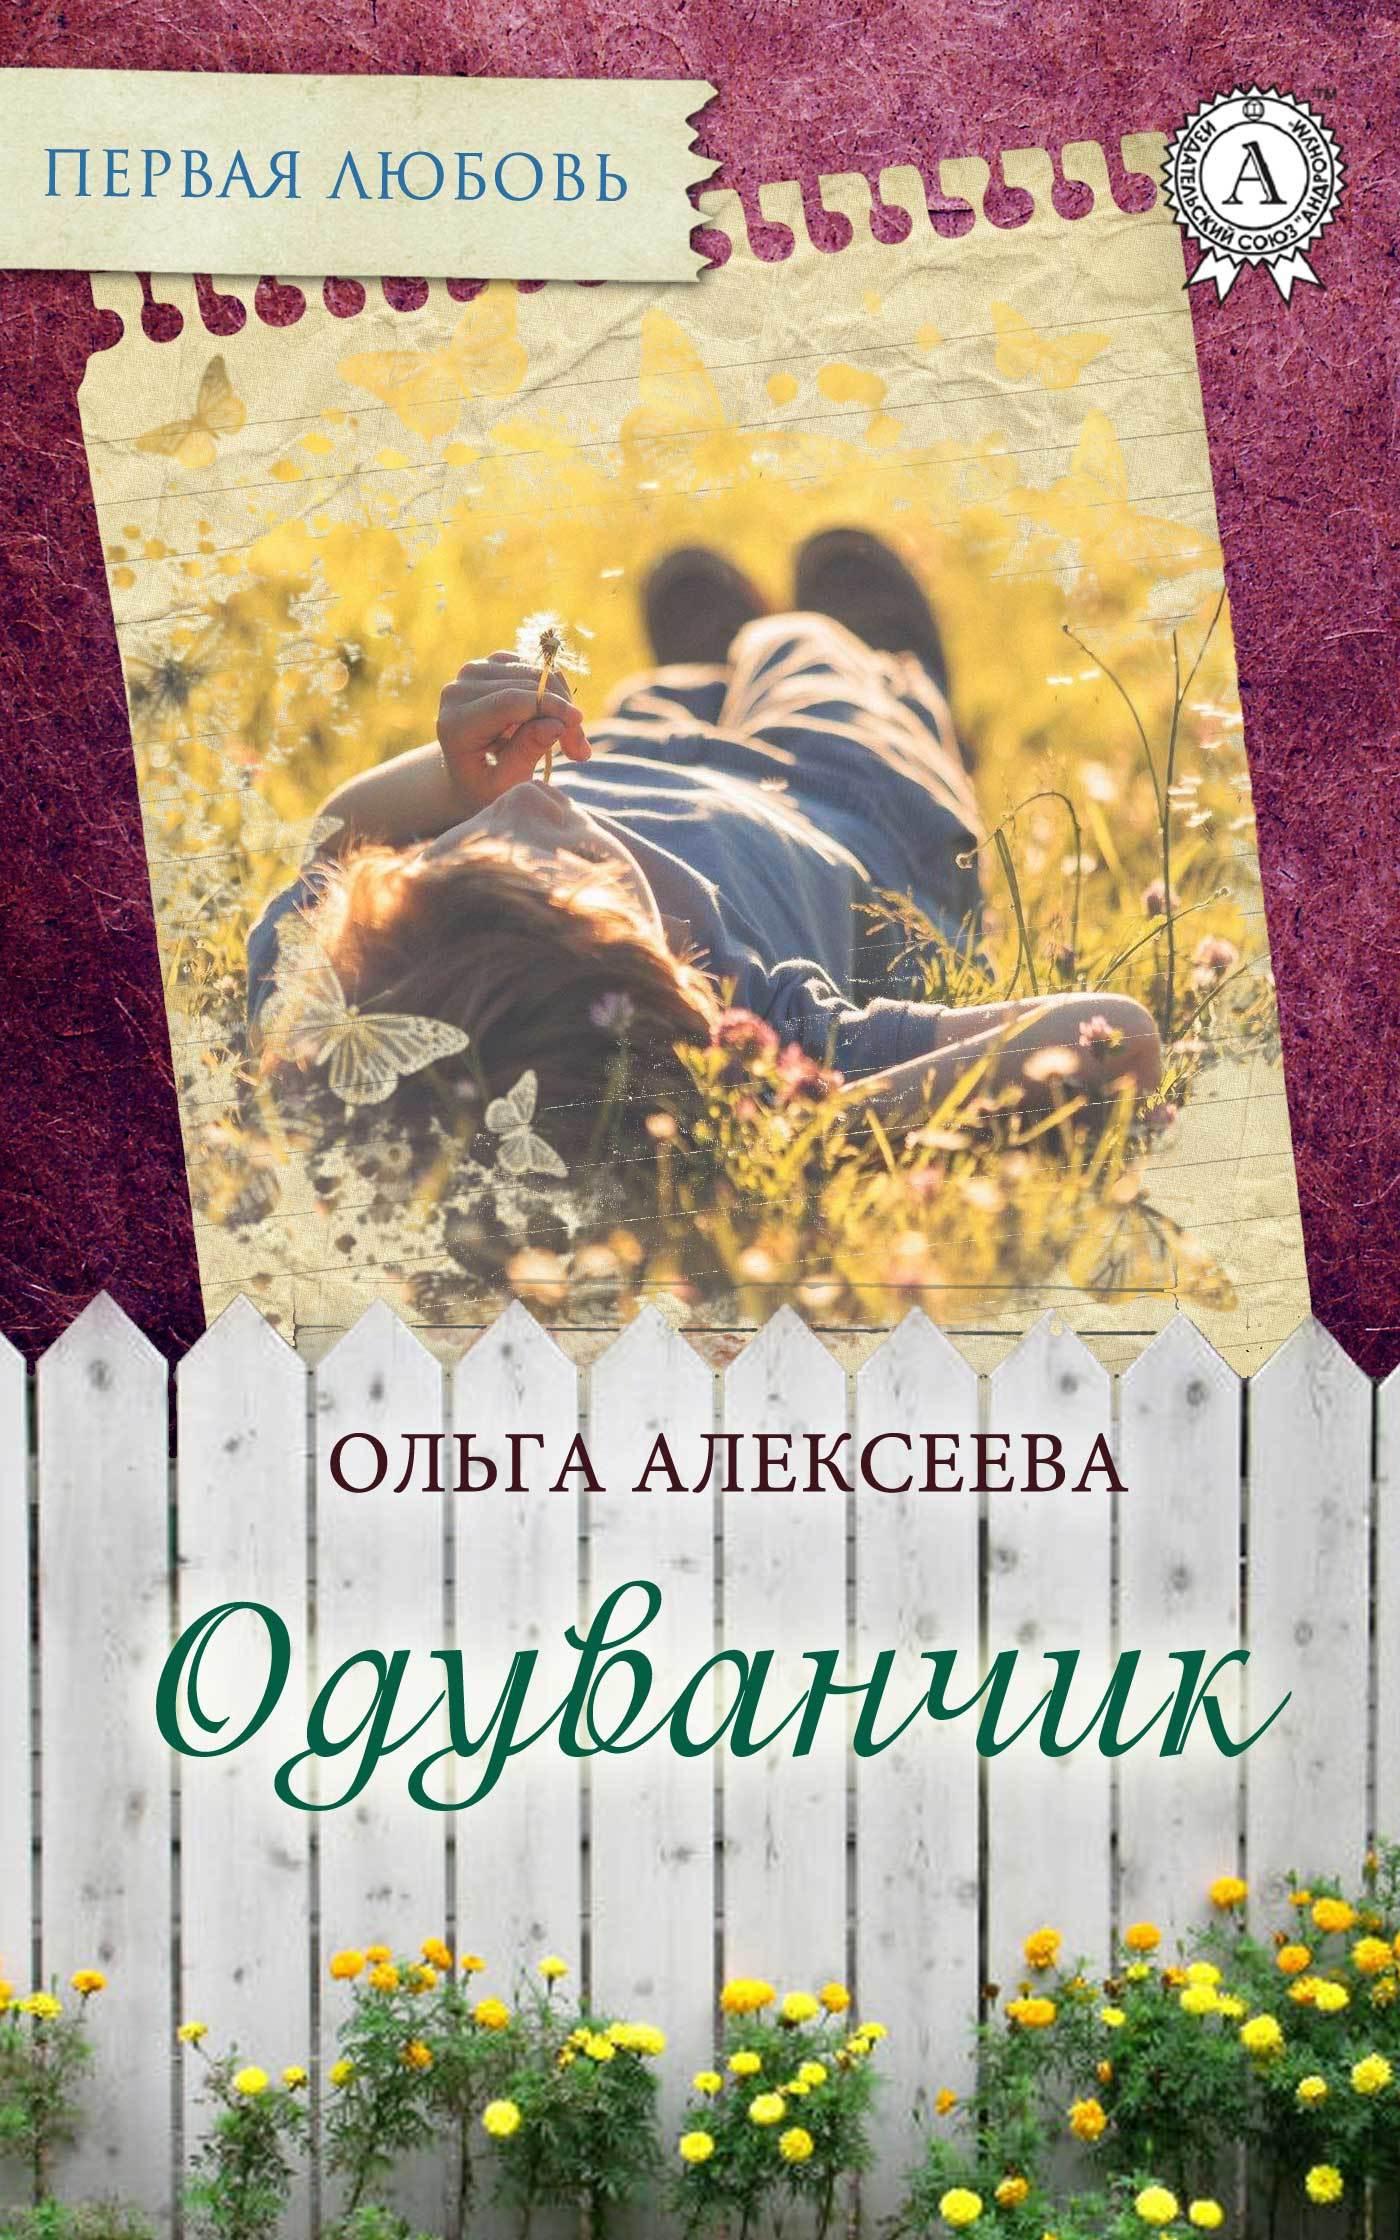 Ольга Алексеева - Одуванчик